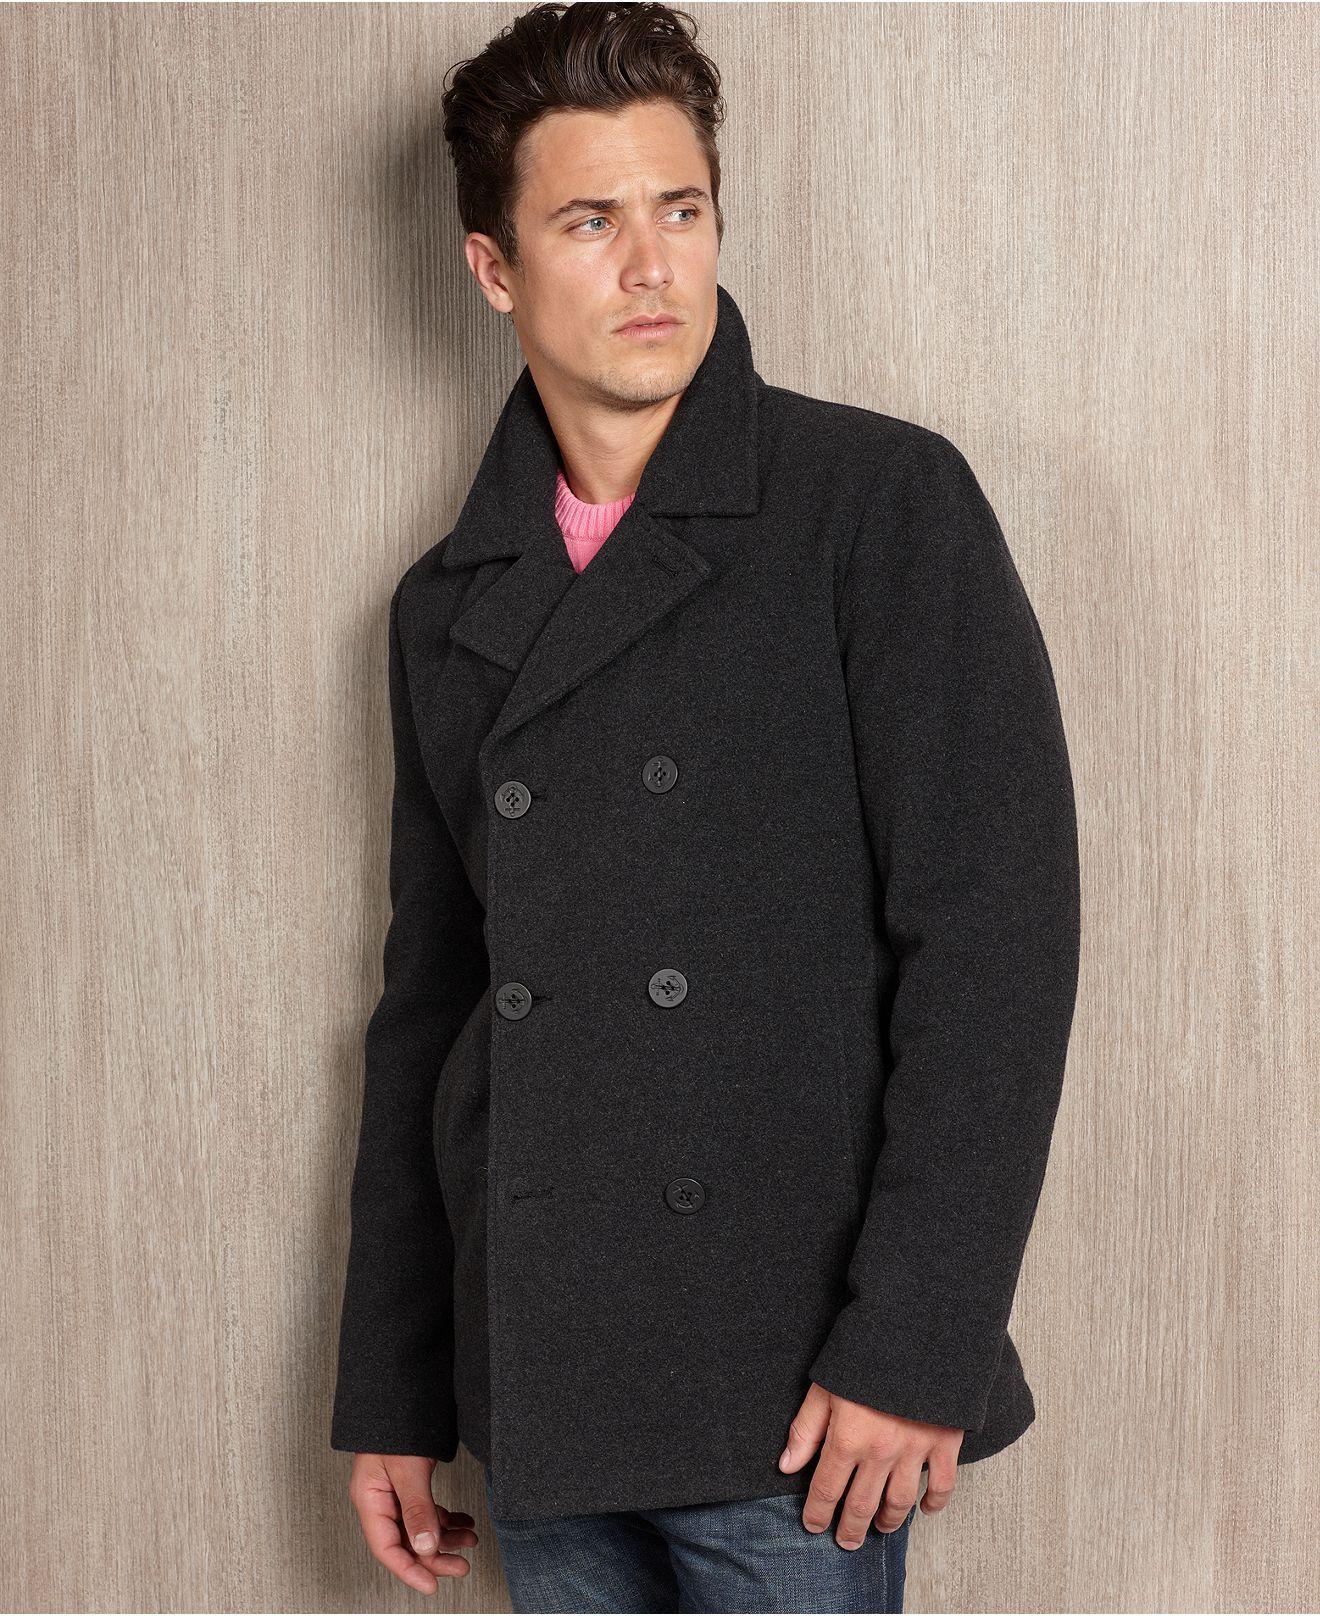 Guess Coat Wool Blend Plush Pea Coat Mens Coats Jackets Macy S Peacoat Outerwear Jackets Mens Coats [ 1616 x 1320 Pixel ]